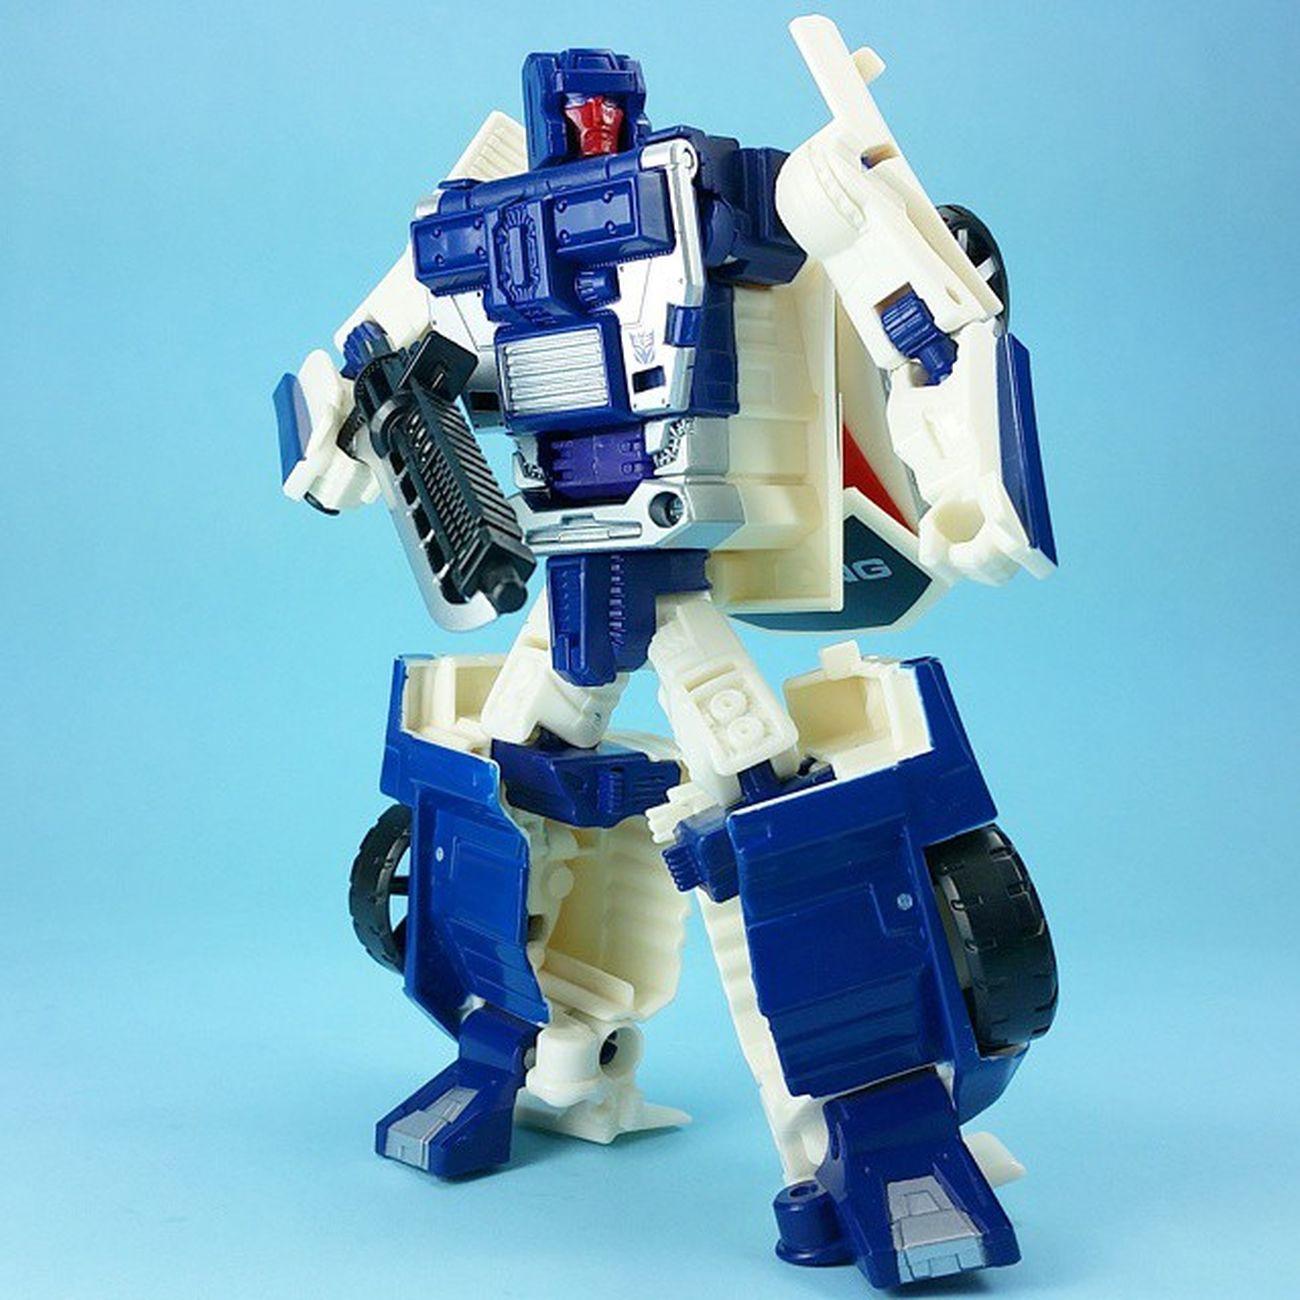 So much G1 appeal. Transformers Combinerwars Menasor Breakdown